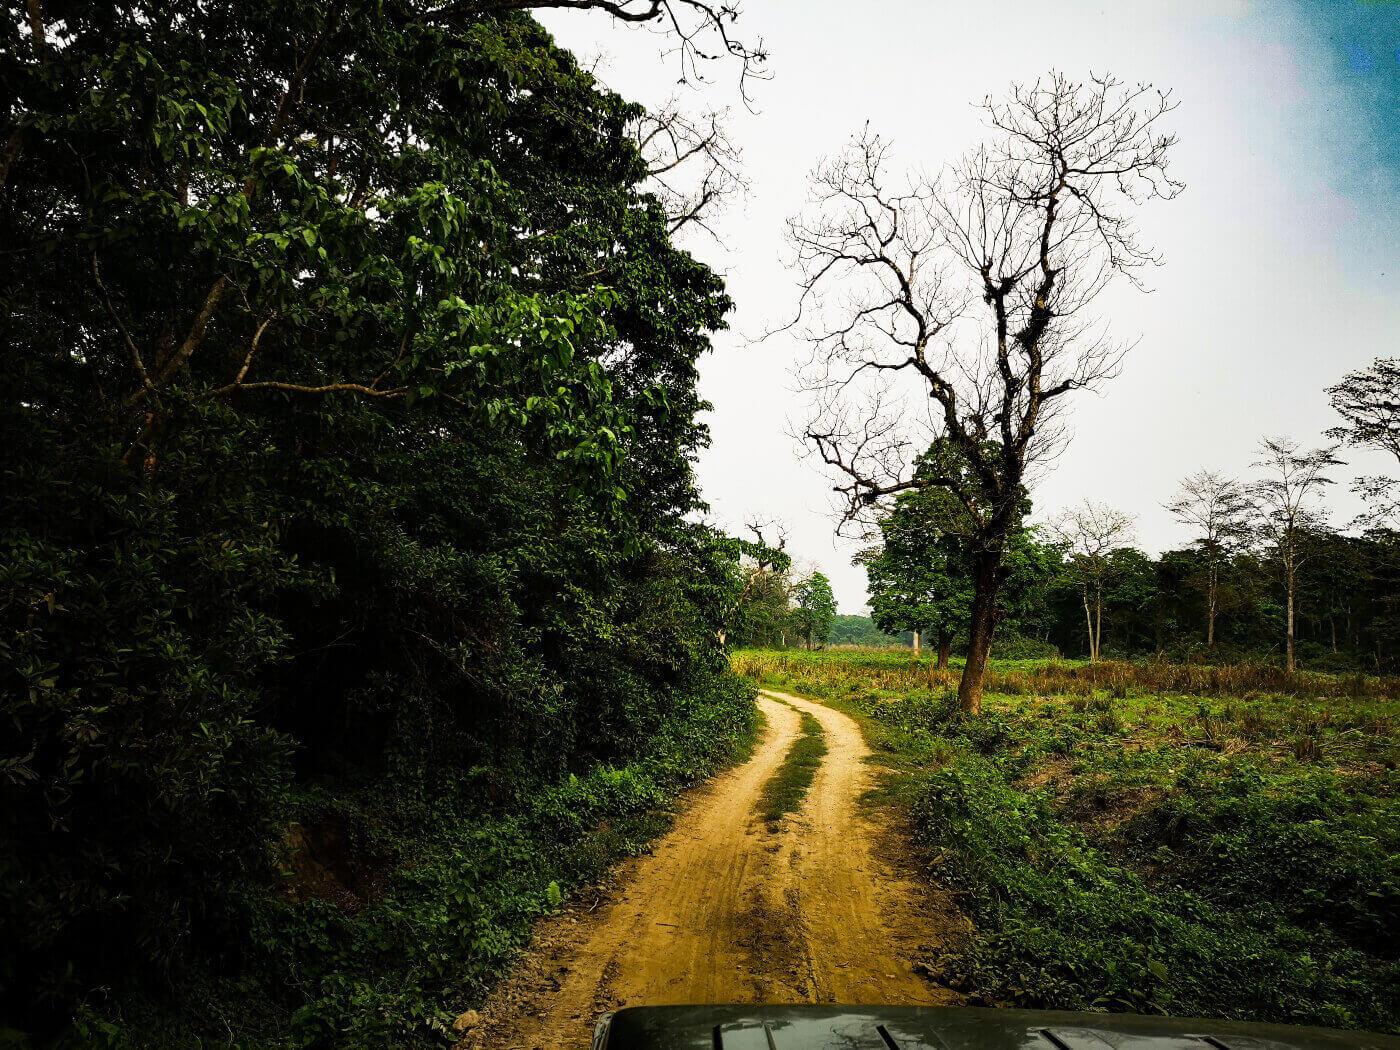 Road in jungle